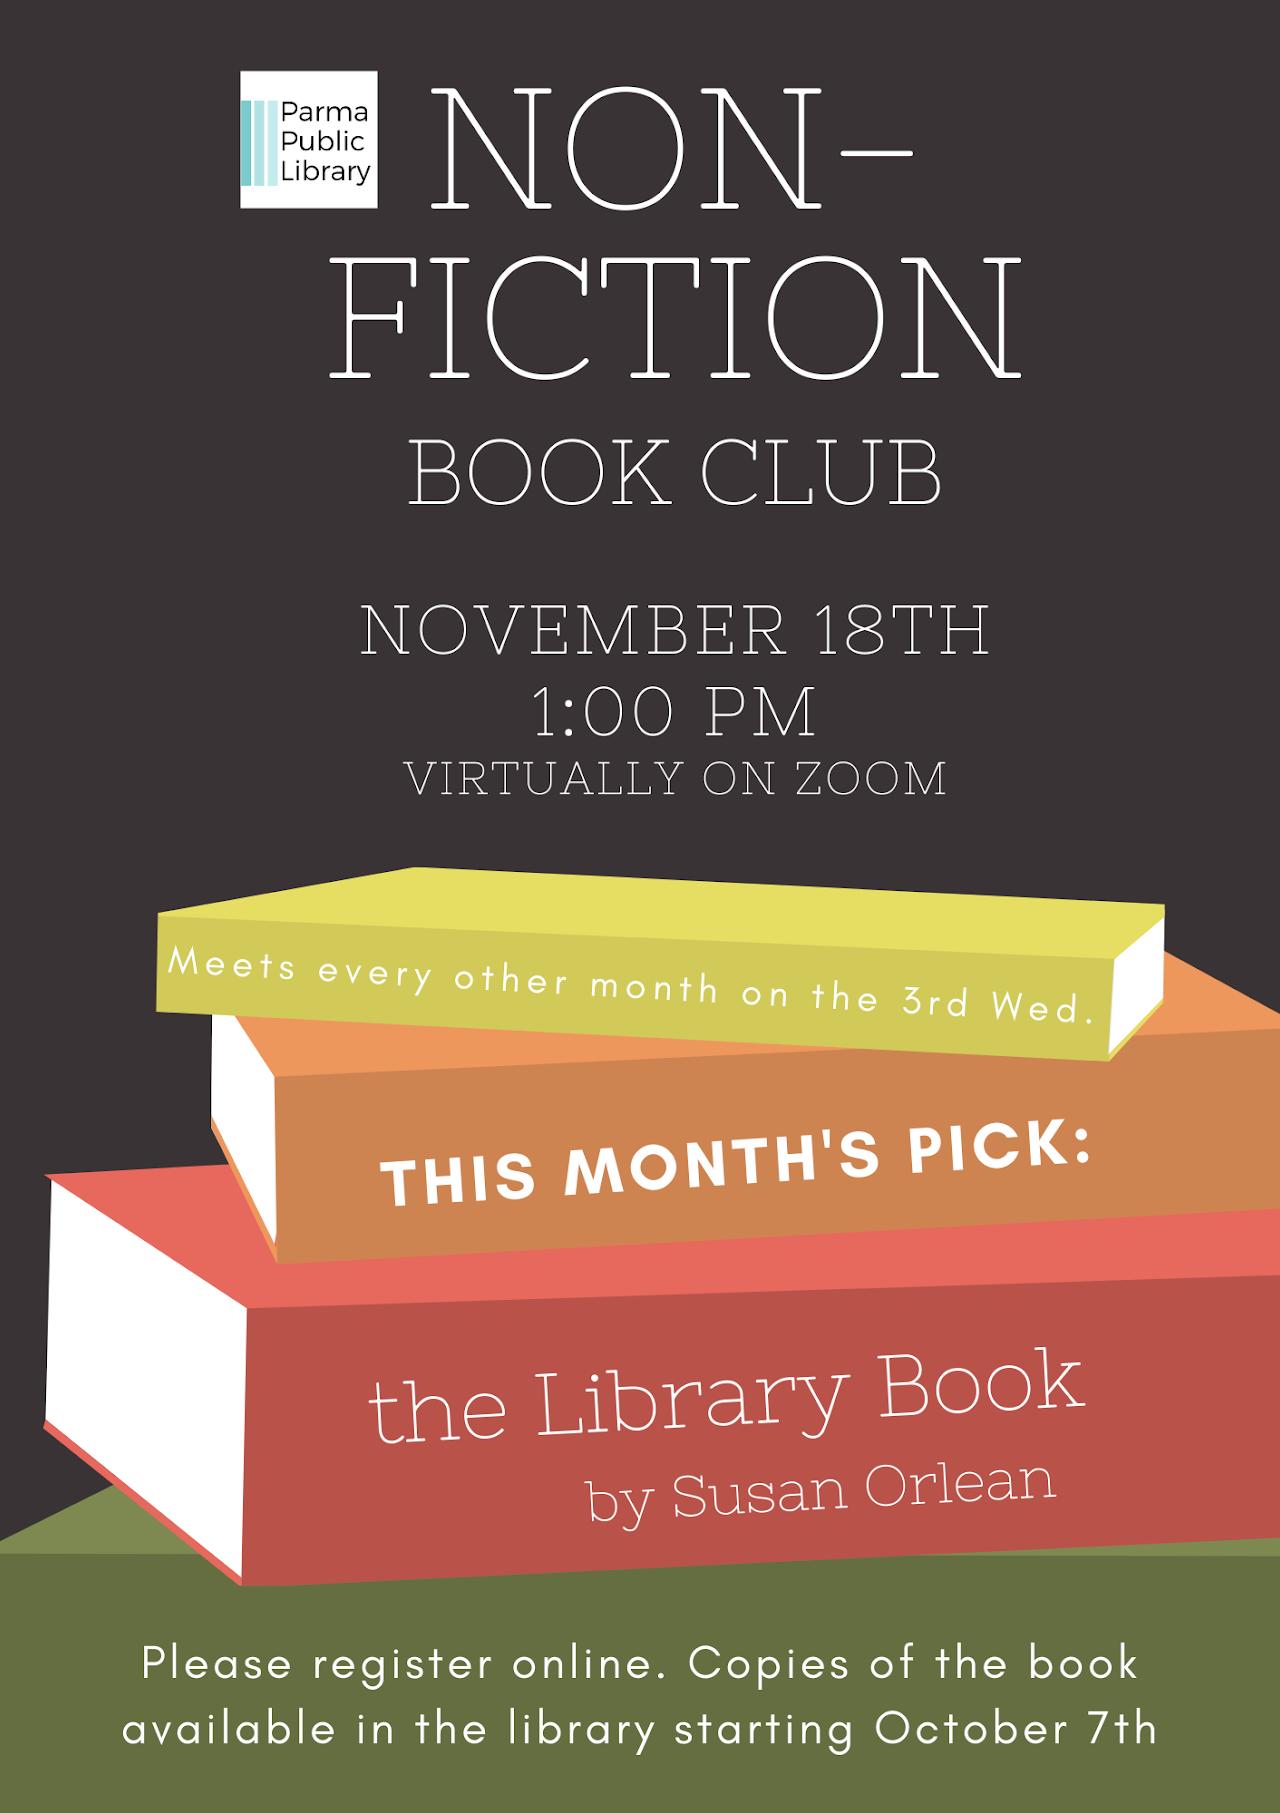 Non-Fiction Book Club VIRTUAL